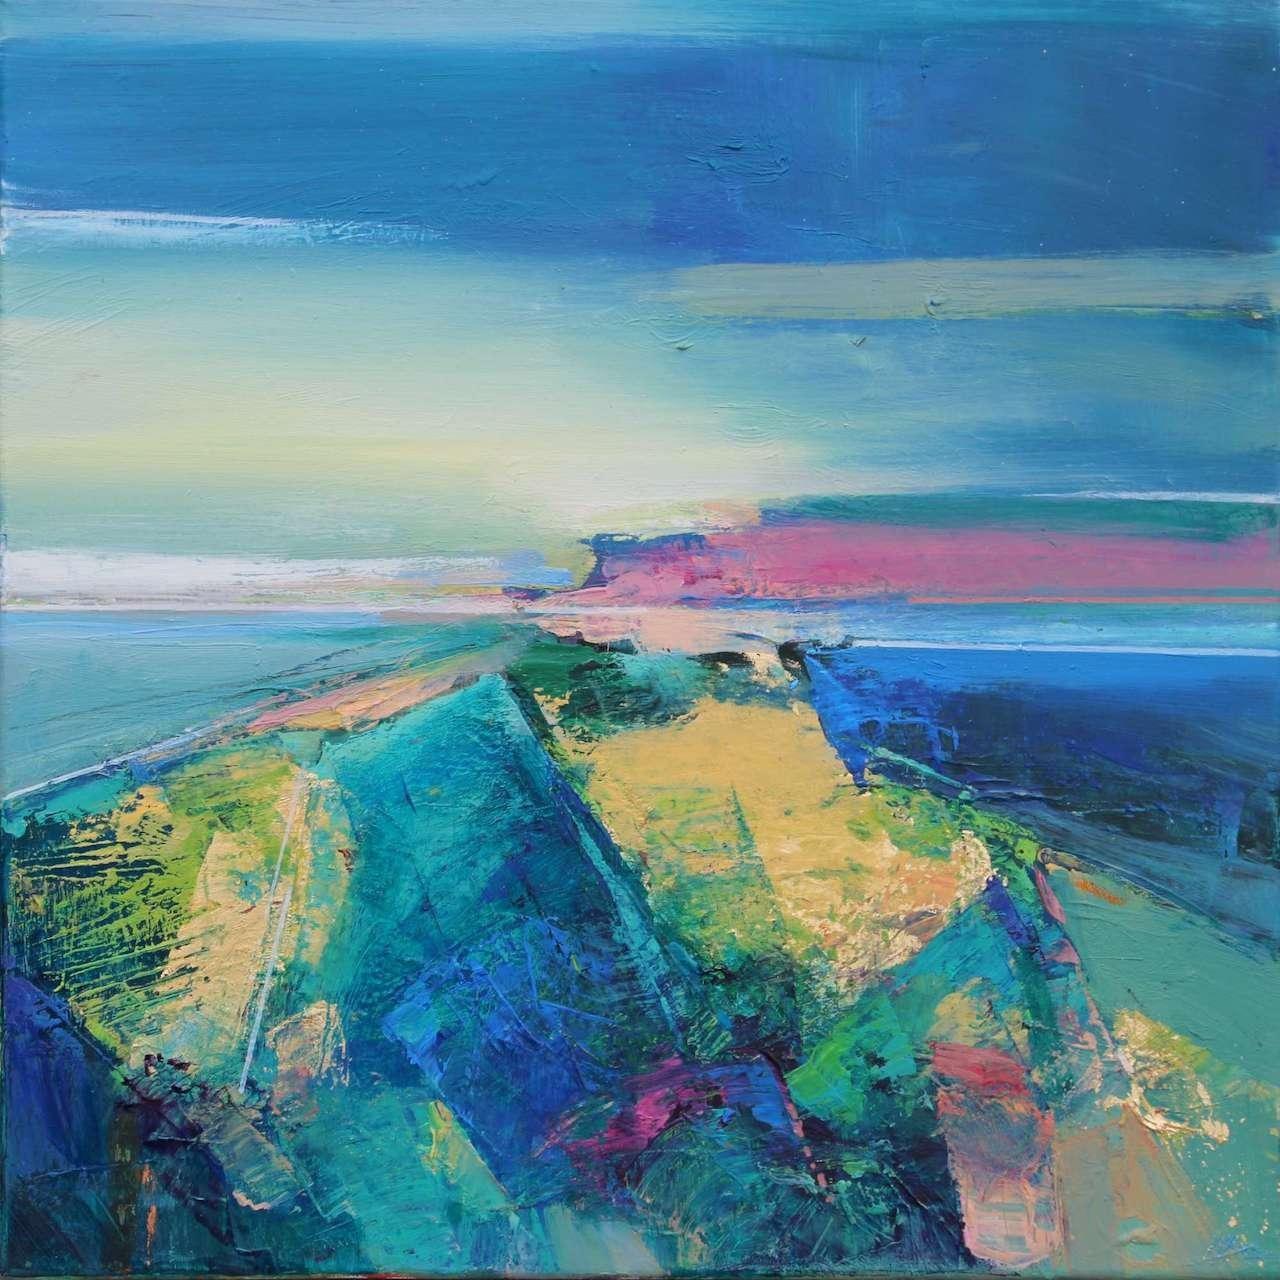 Magdalena Morey, Ocean Light 2, Original Contemporary Abstract Painting